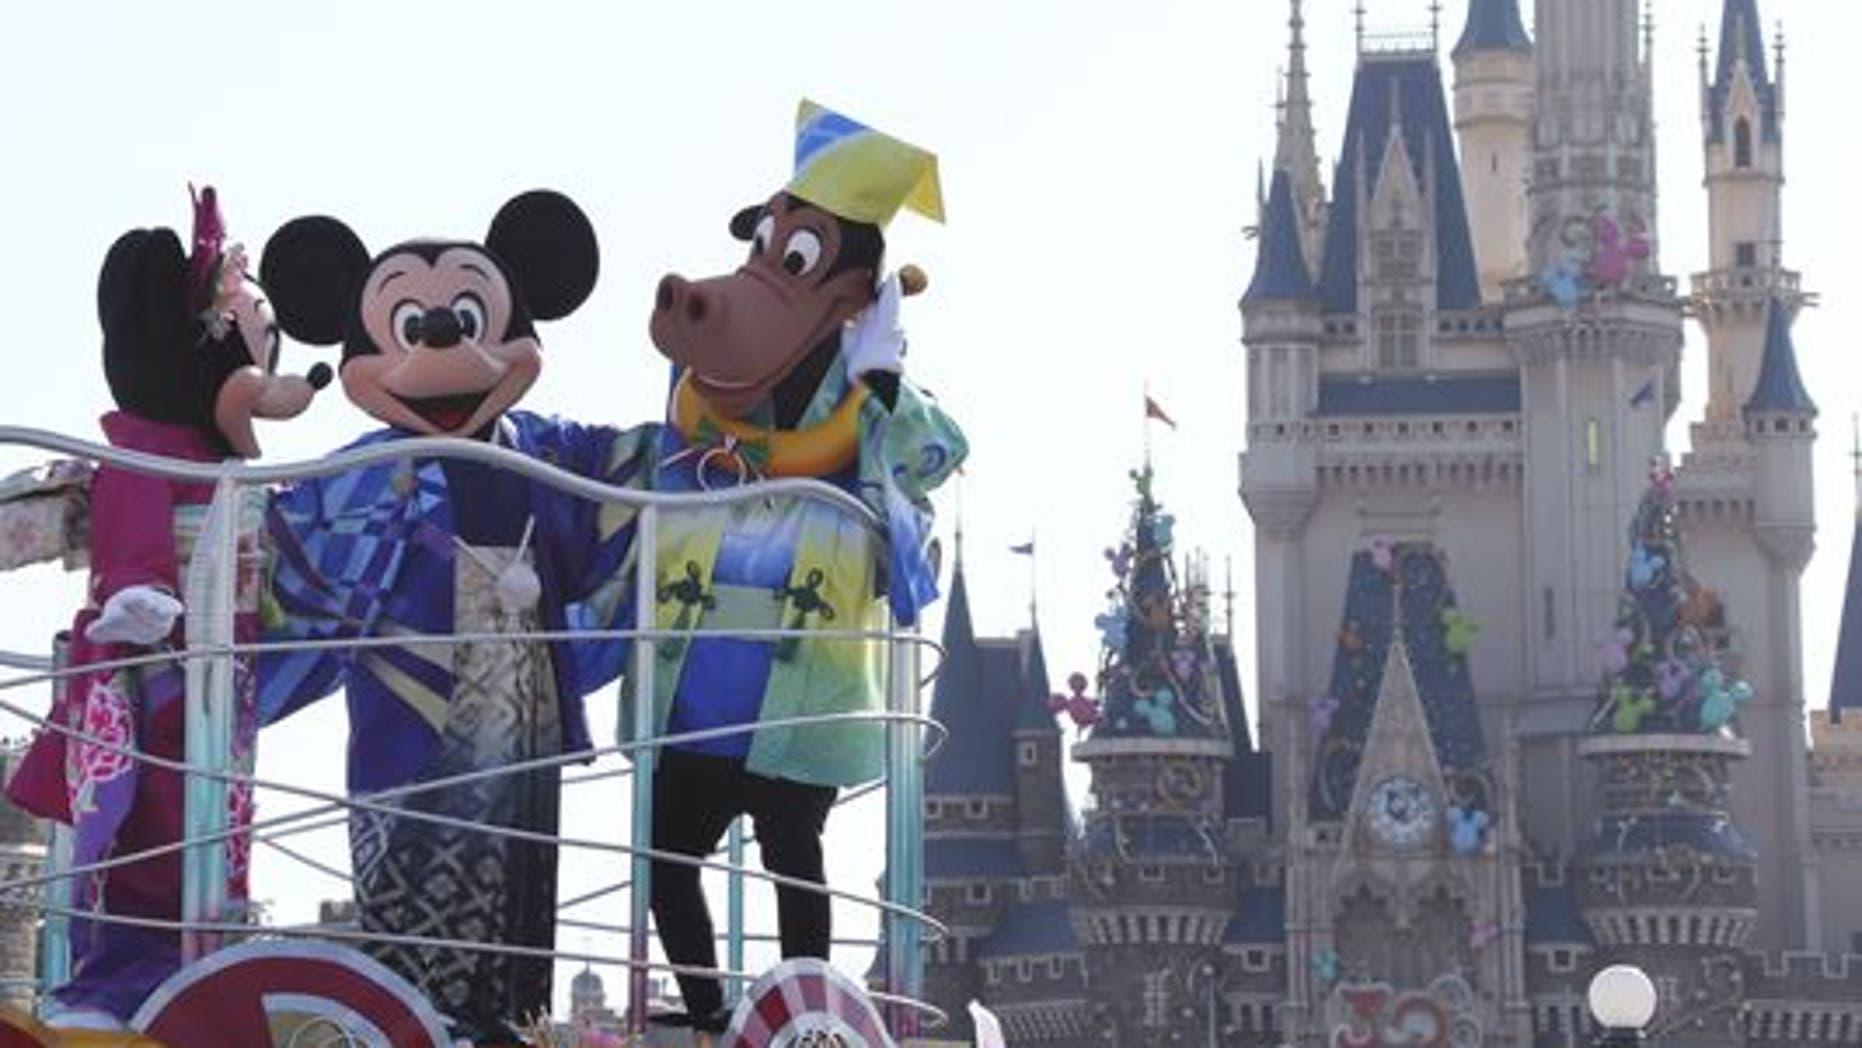 Walt Disney Japan has apologized for an insensitive tweet.